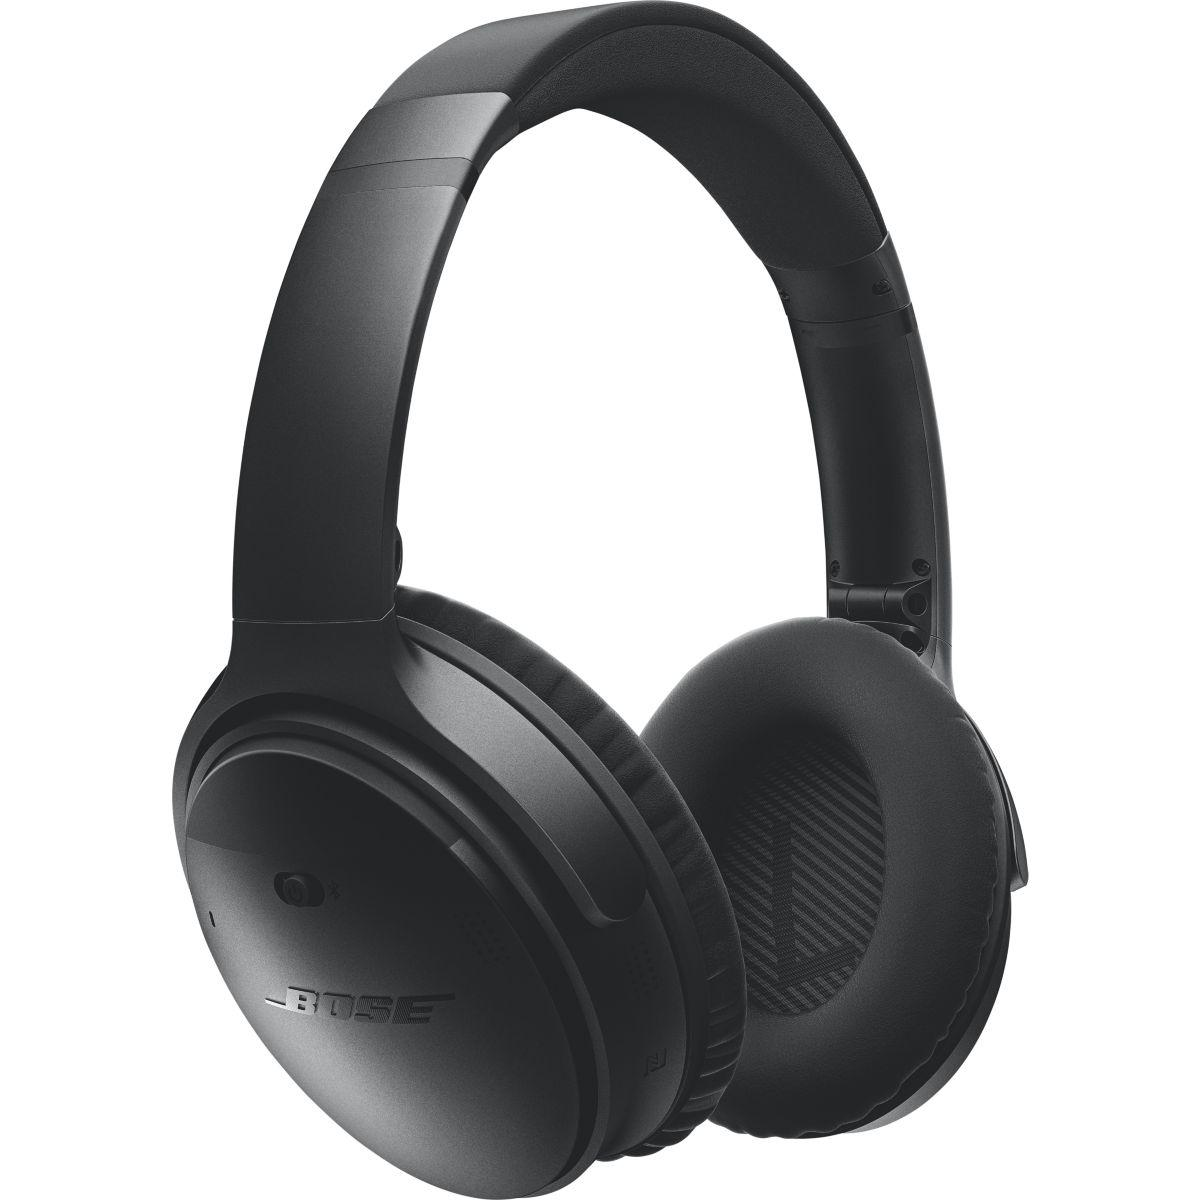 Kopfhörer Rauschunterdrückung Bluetooth Bose QC 35 - Schwarz